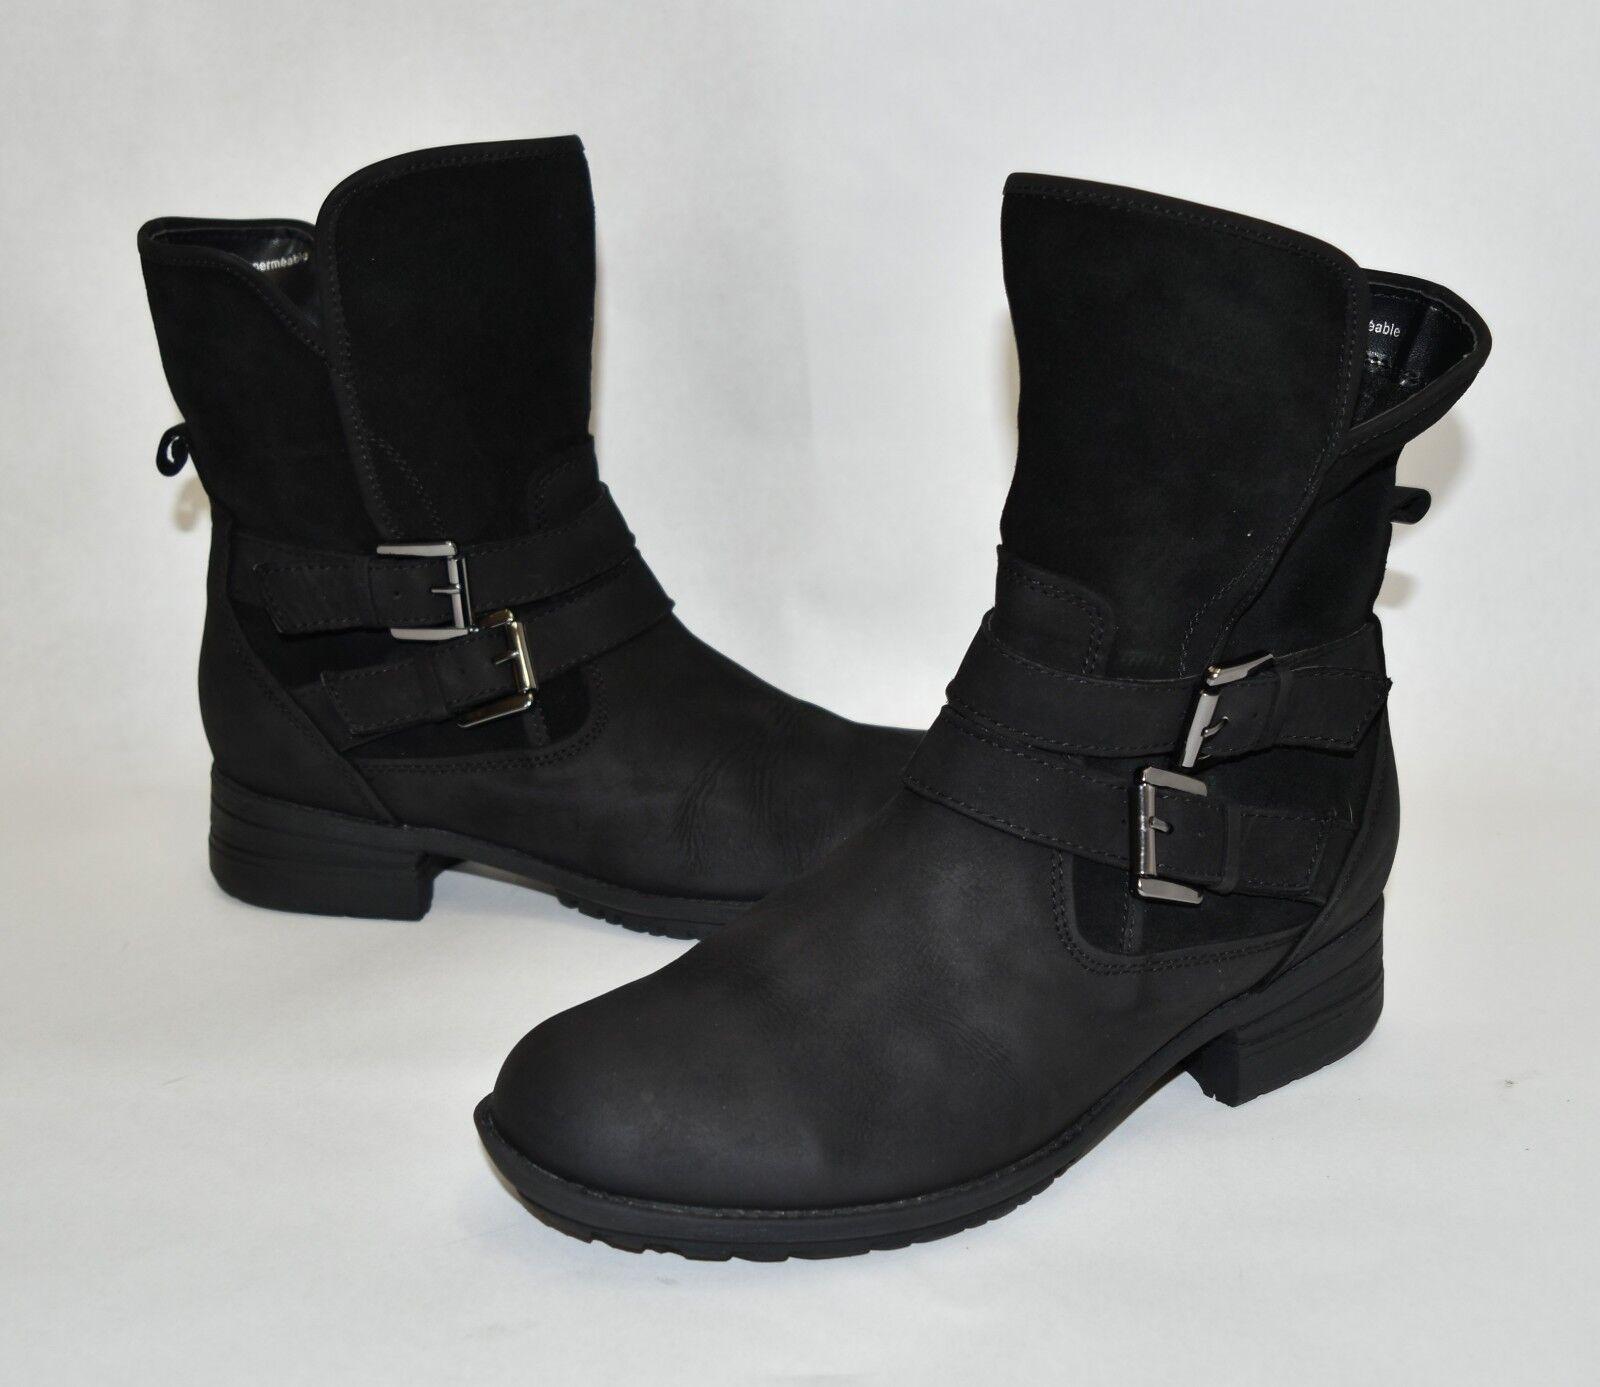 Blondo Tula Waterproof avvio nero Suede and Nubuck Leather B5873 Dimensione 6